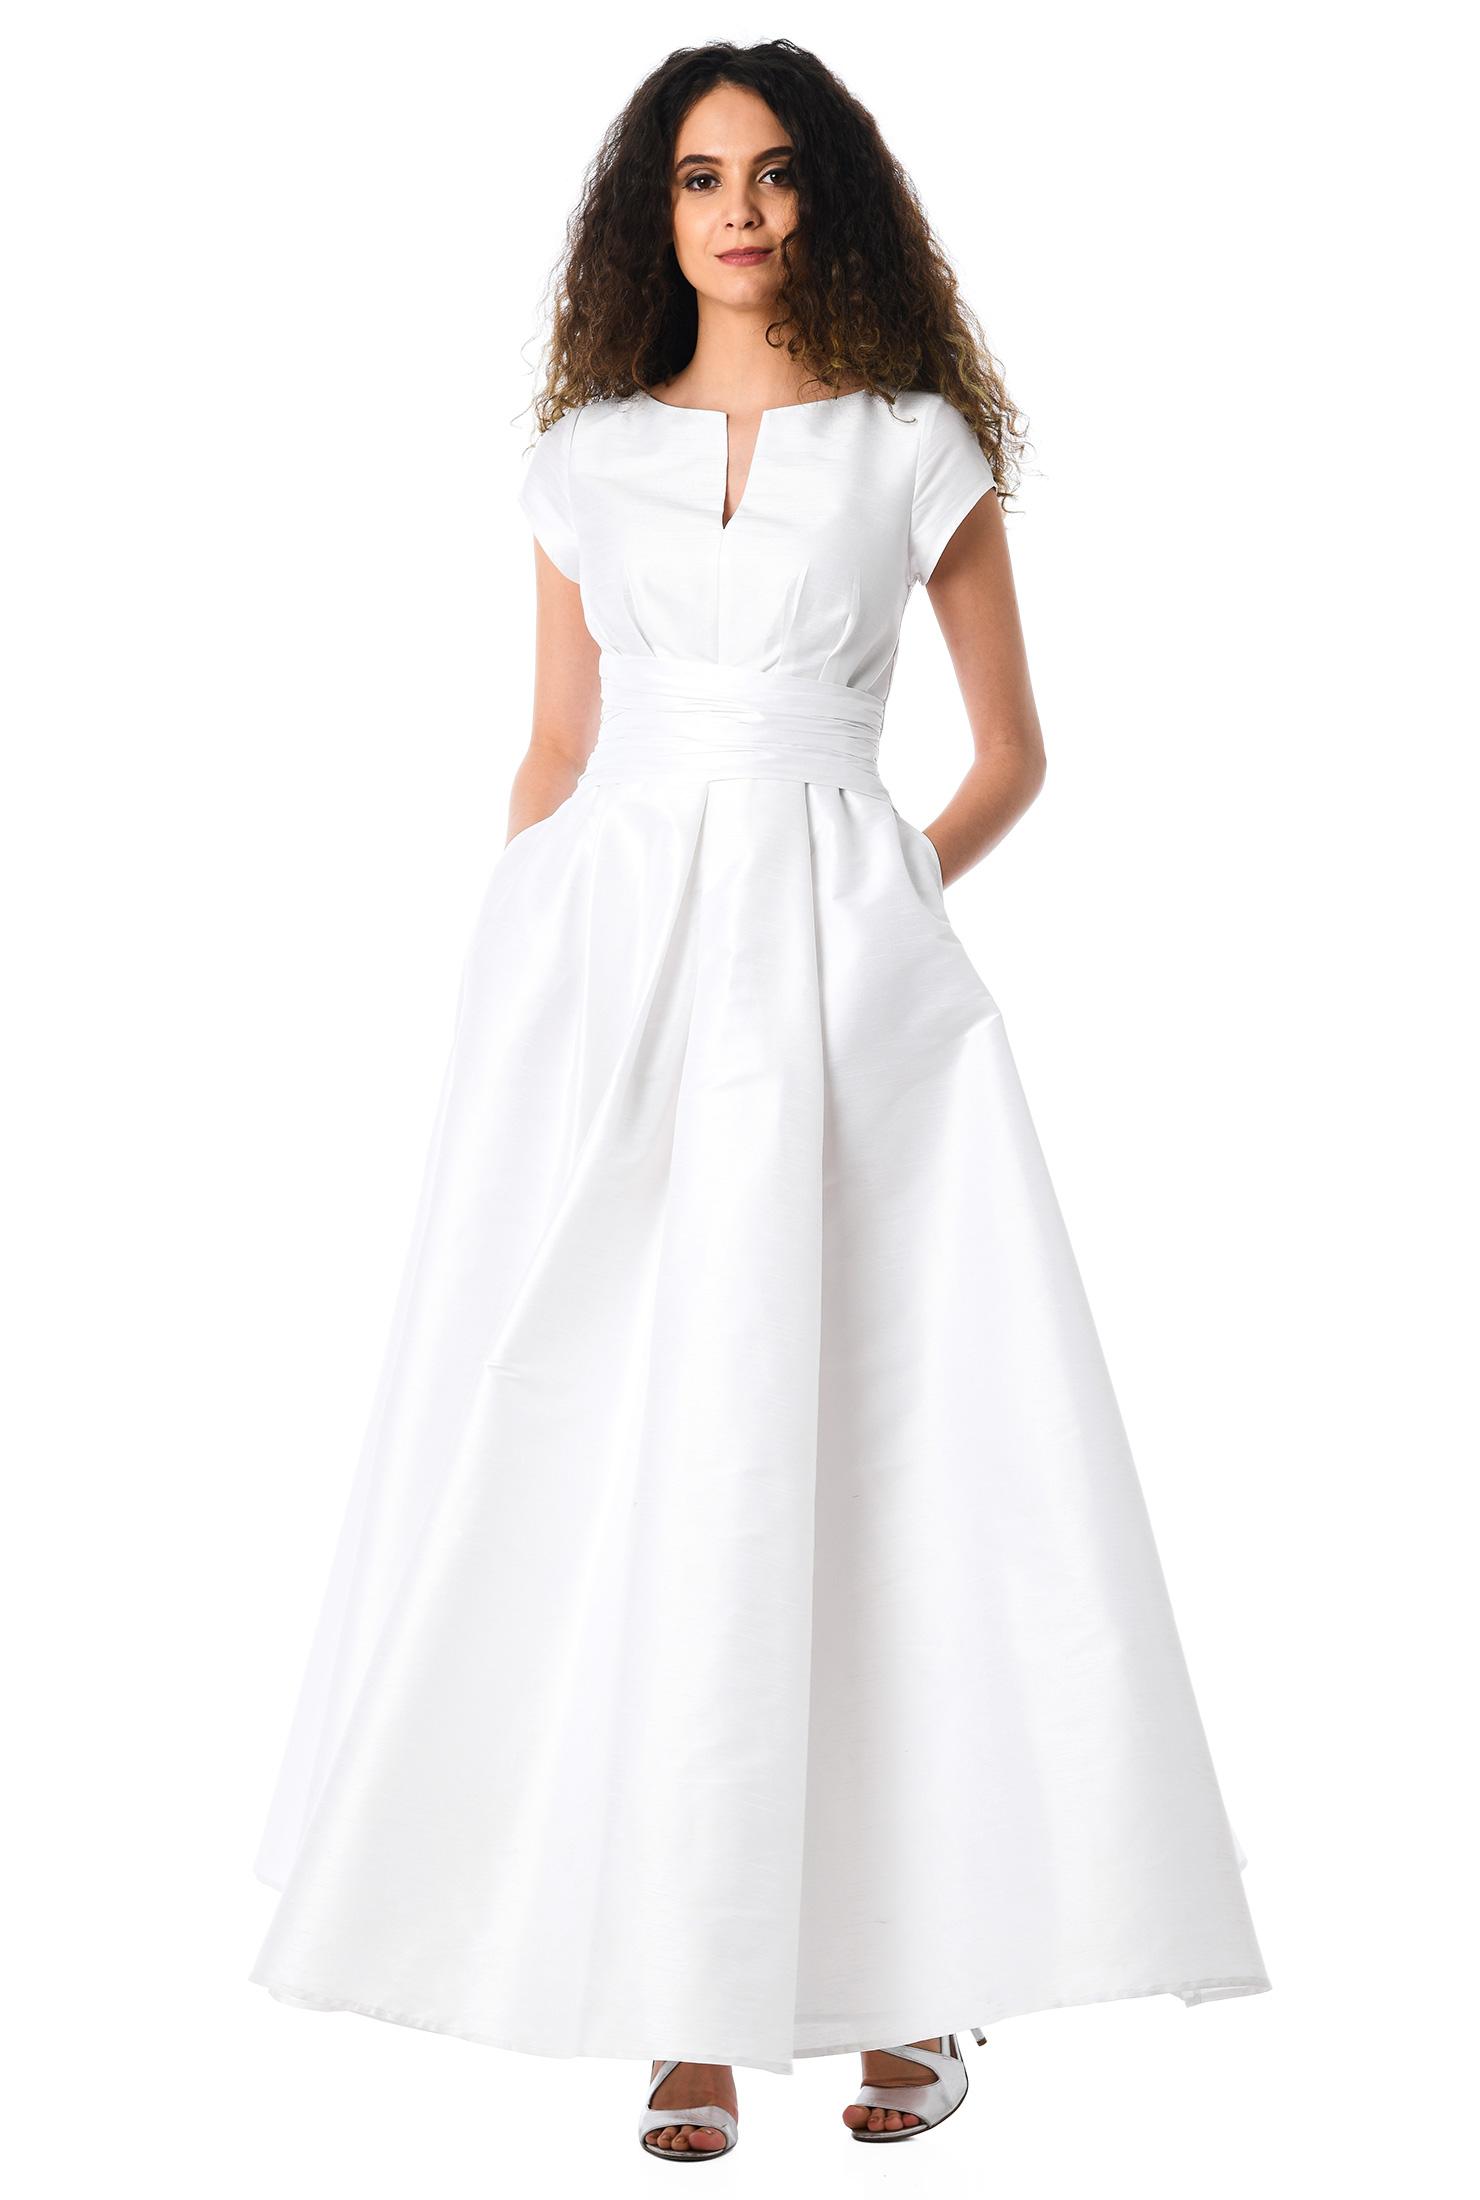 837ad60f6 Women s Fashion Clothing 0-36W and Custom